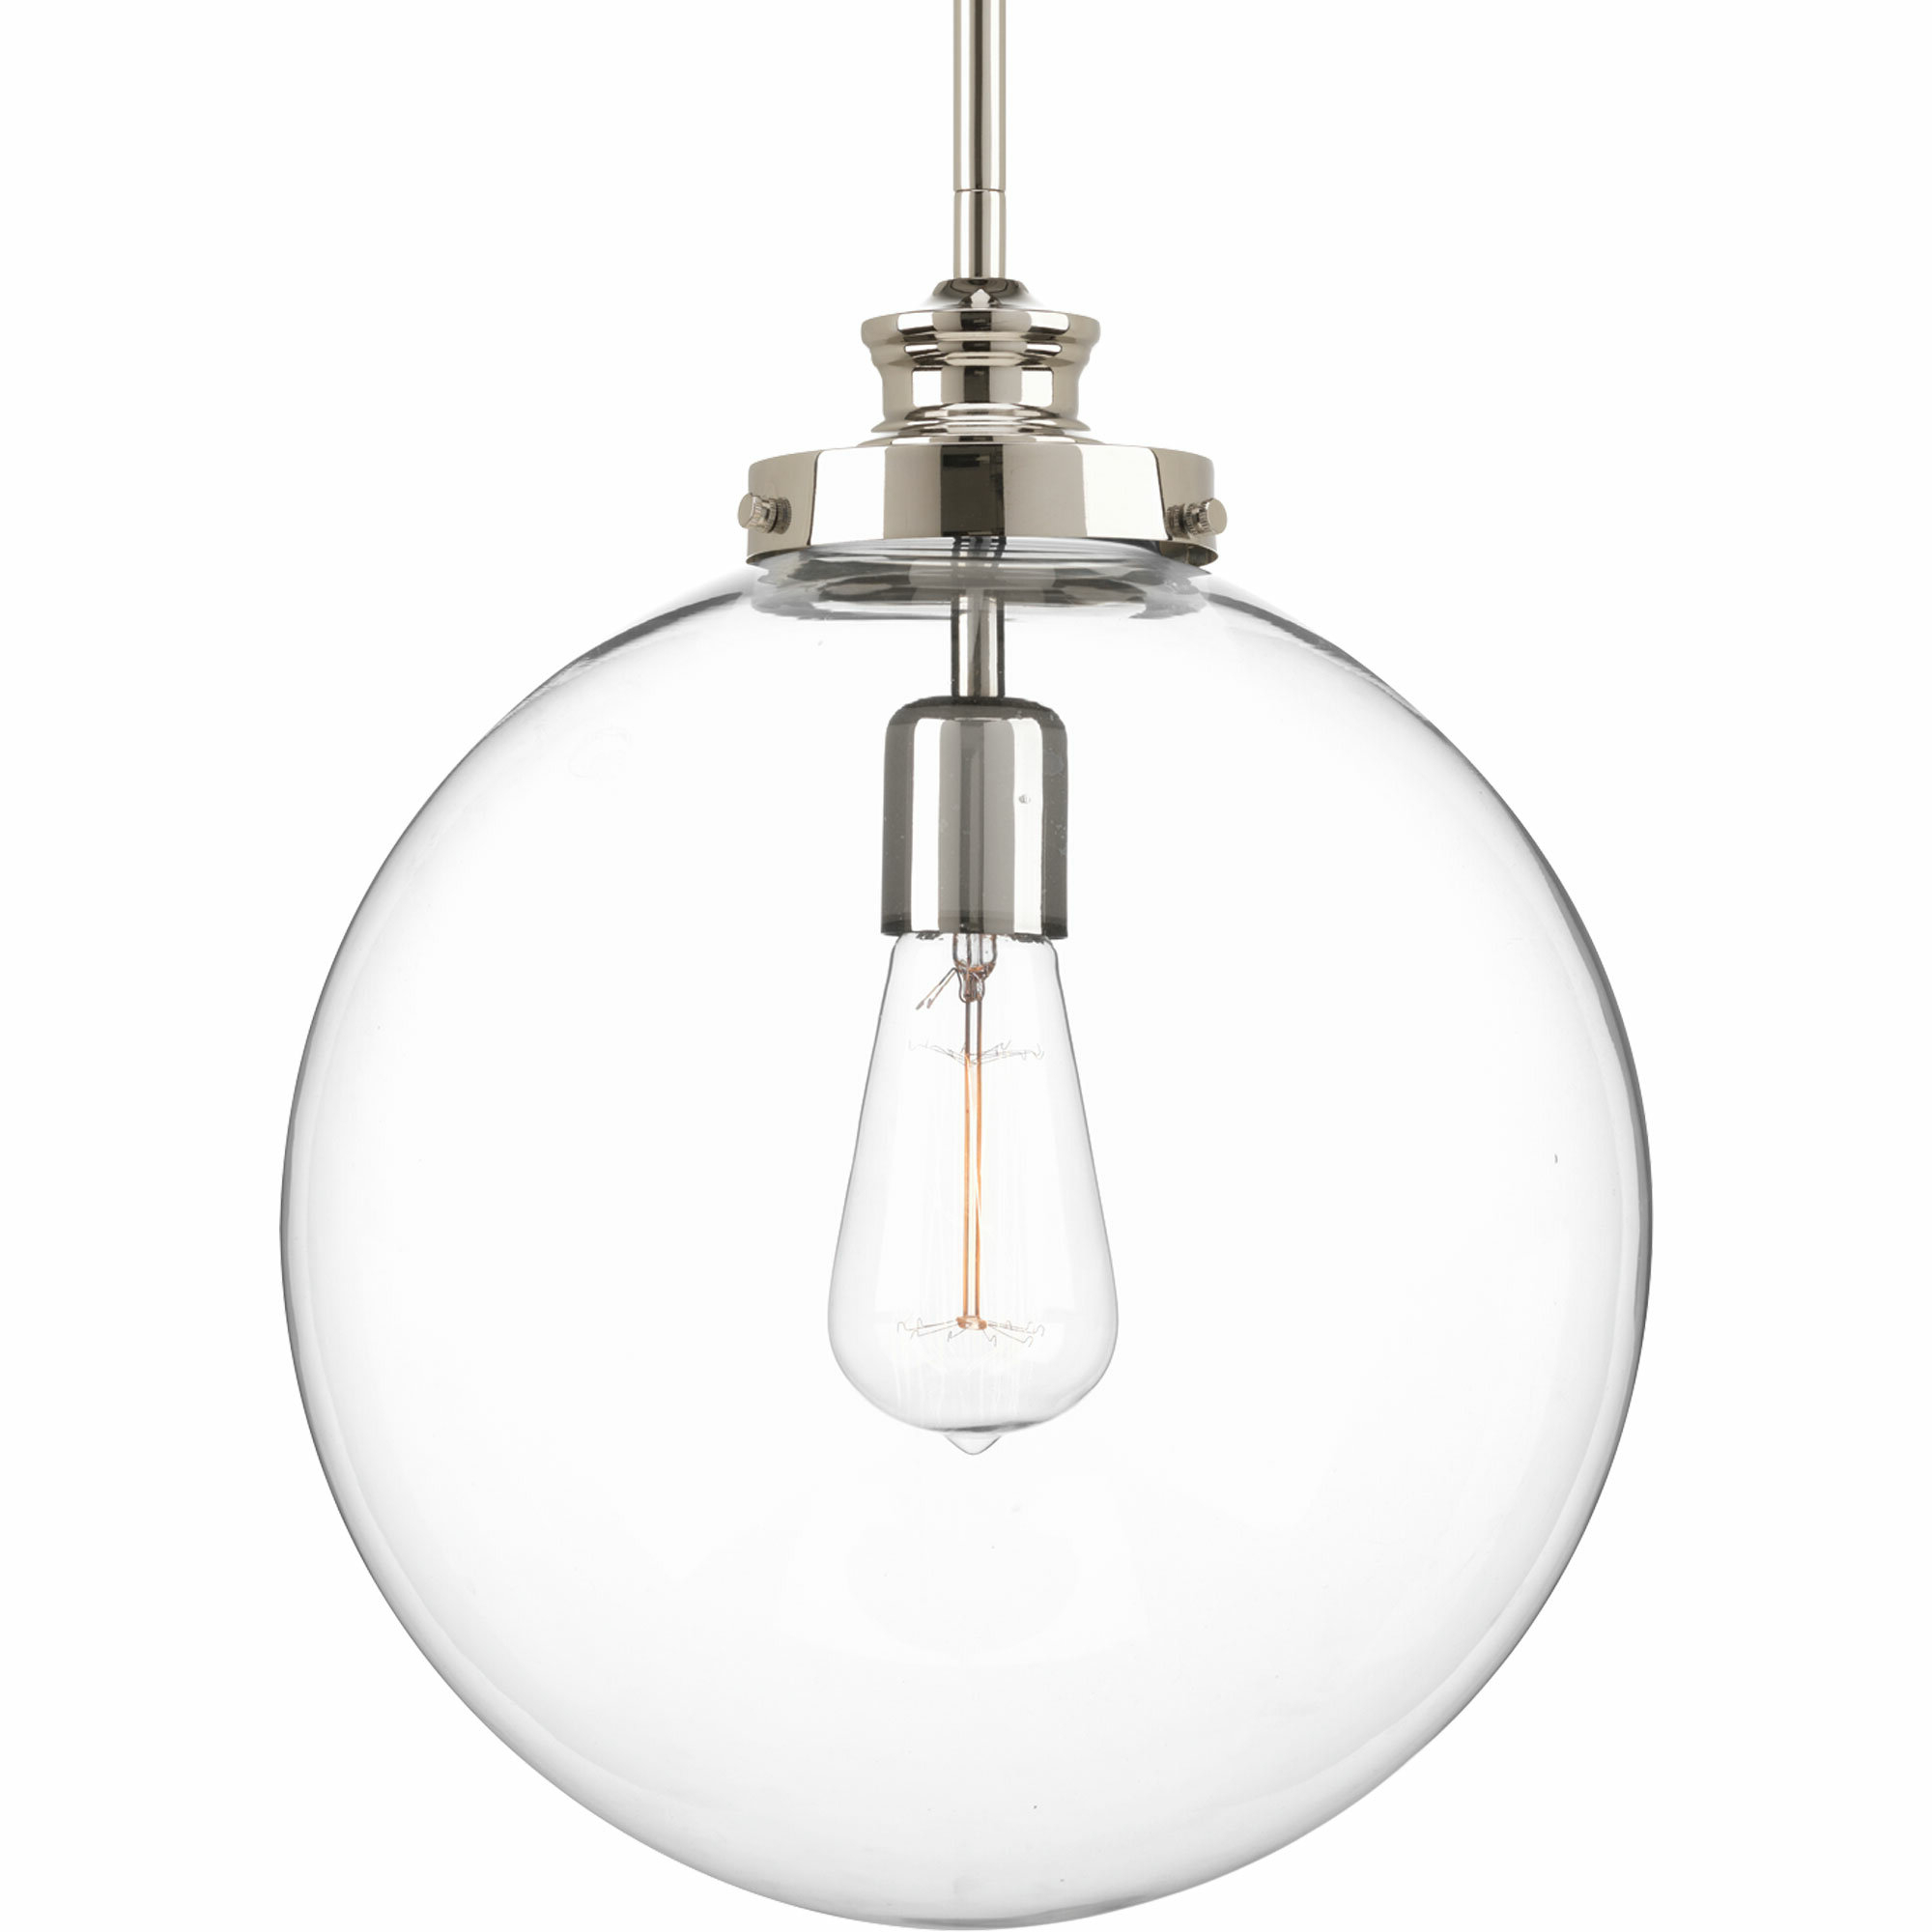 Betsy 1 Light Single Globe Pendants Regarding Trendy Cayden 1 Light Single Globe Pendant (View 19 of 20)